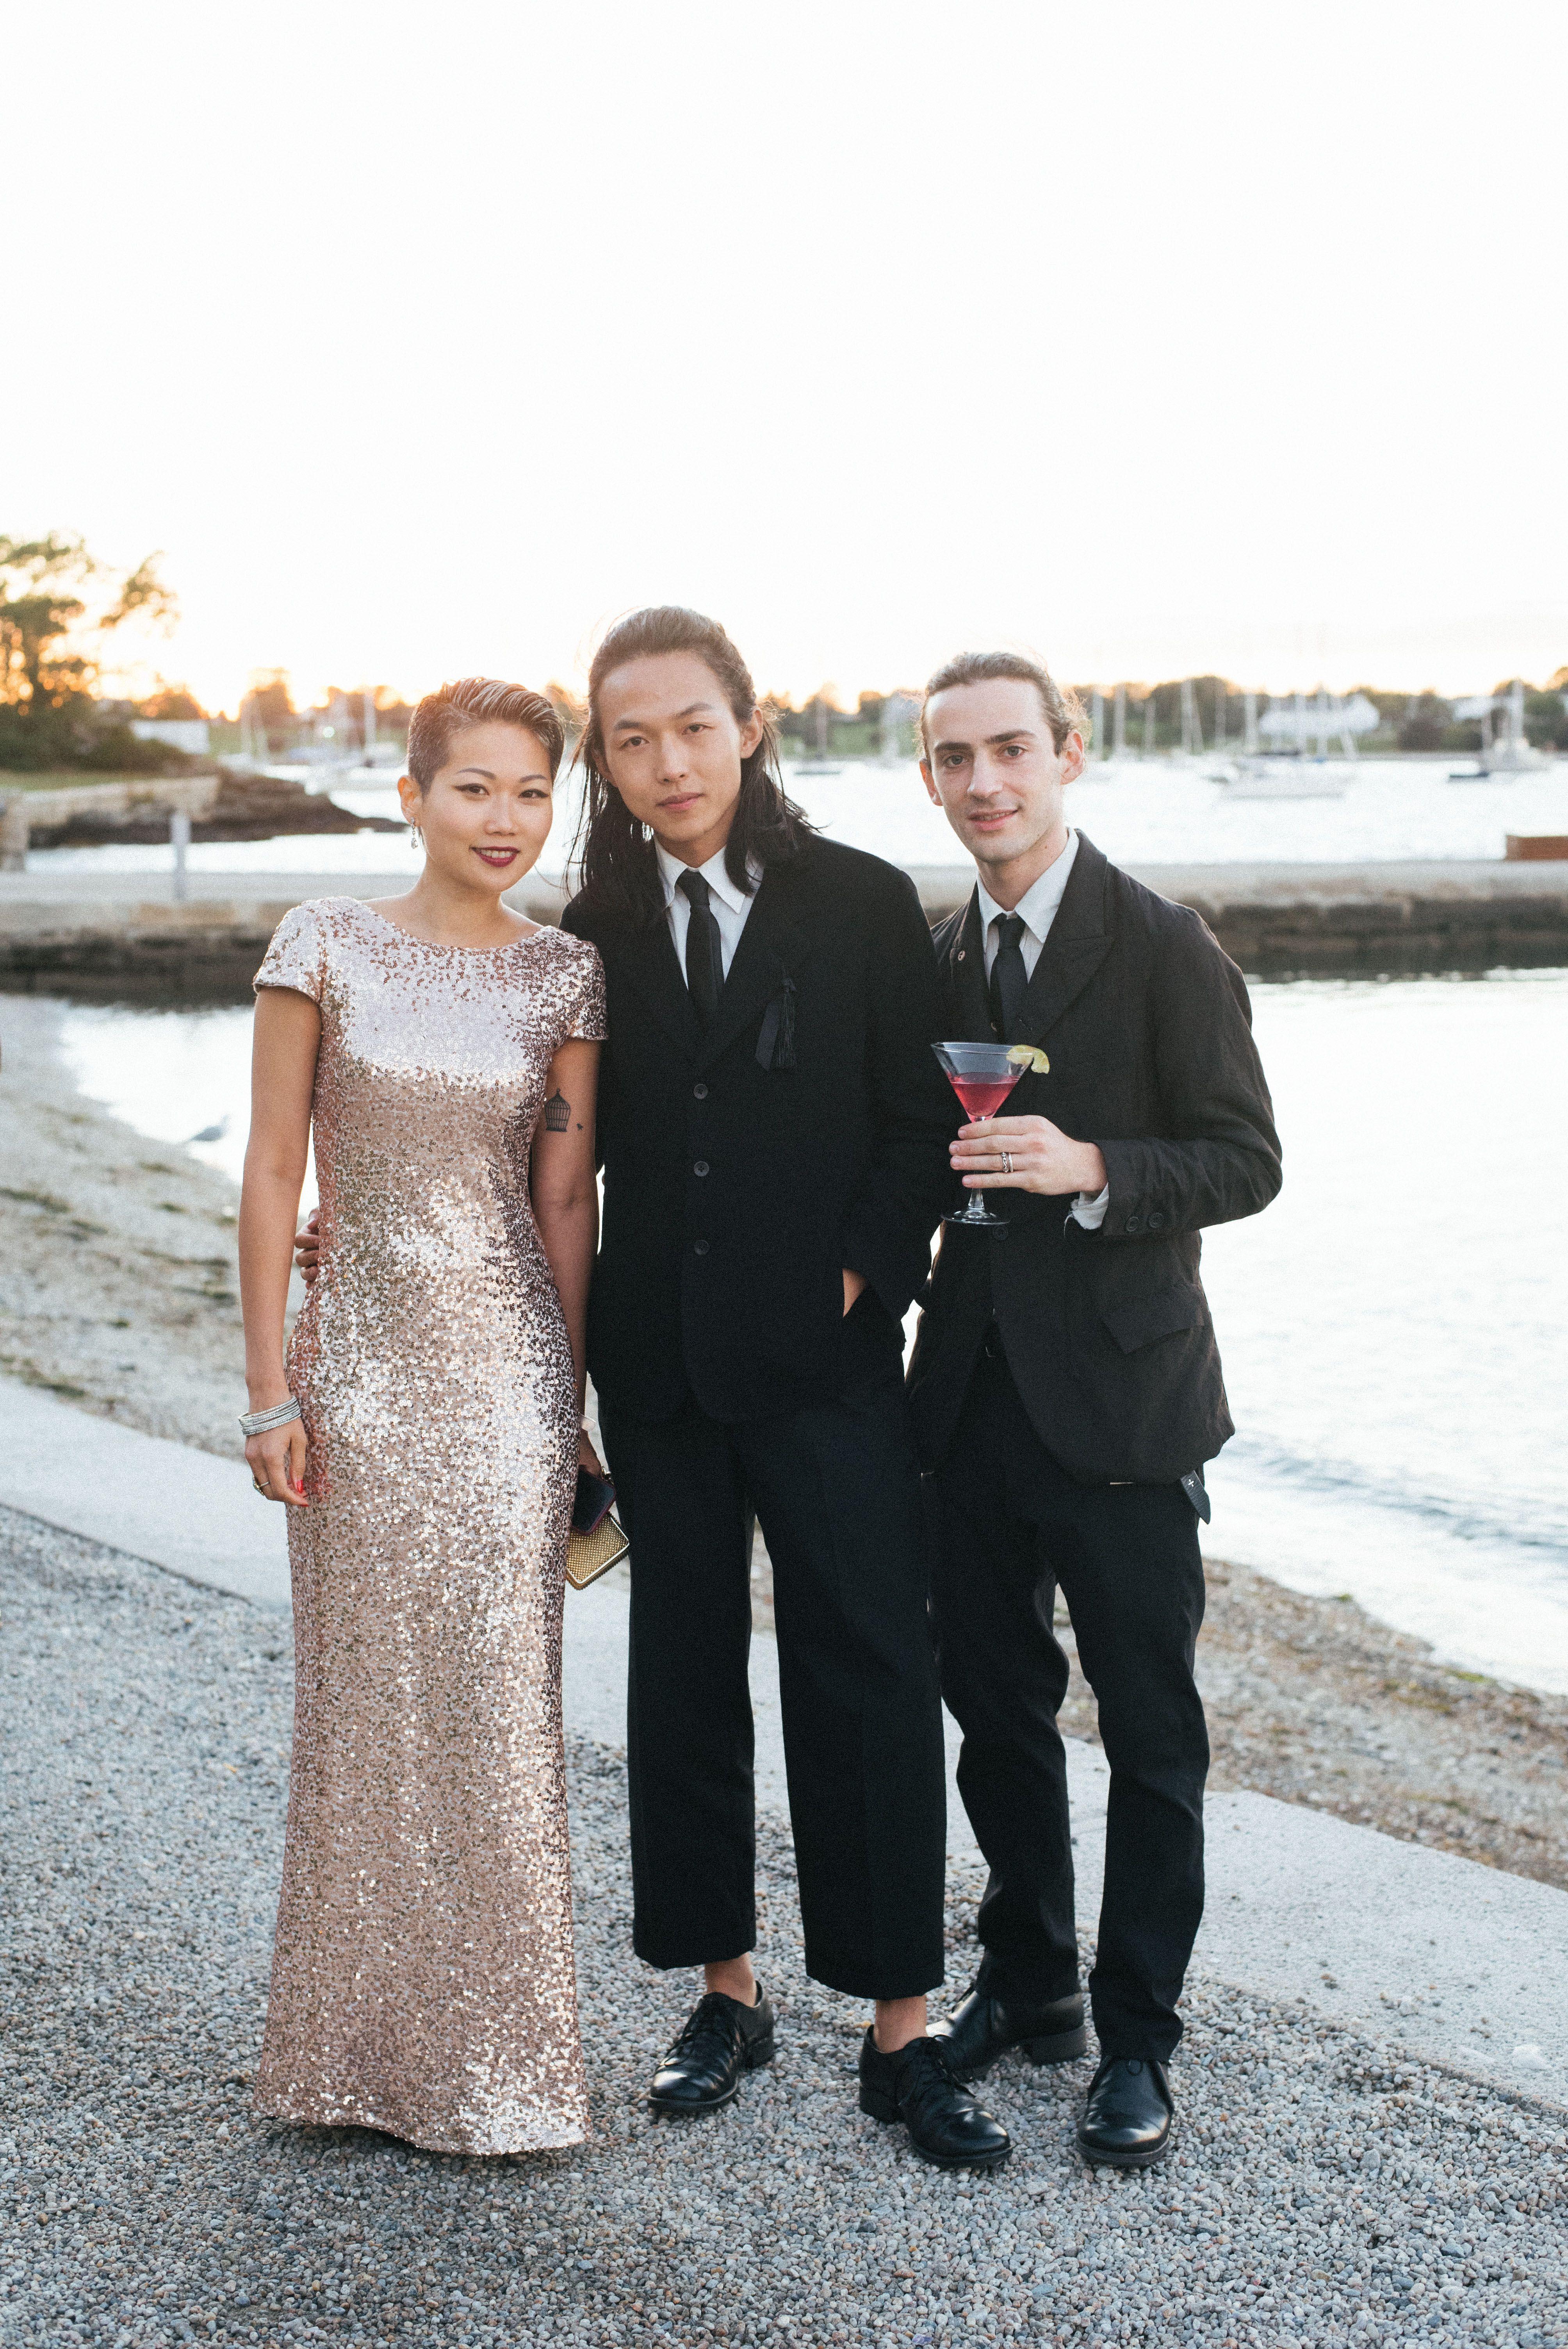 A Comprehensive Guide to Wedding Guest Attire Wedding